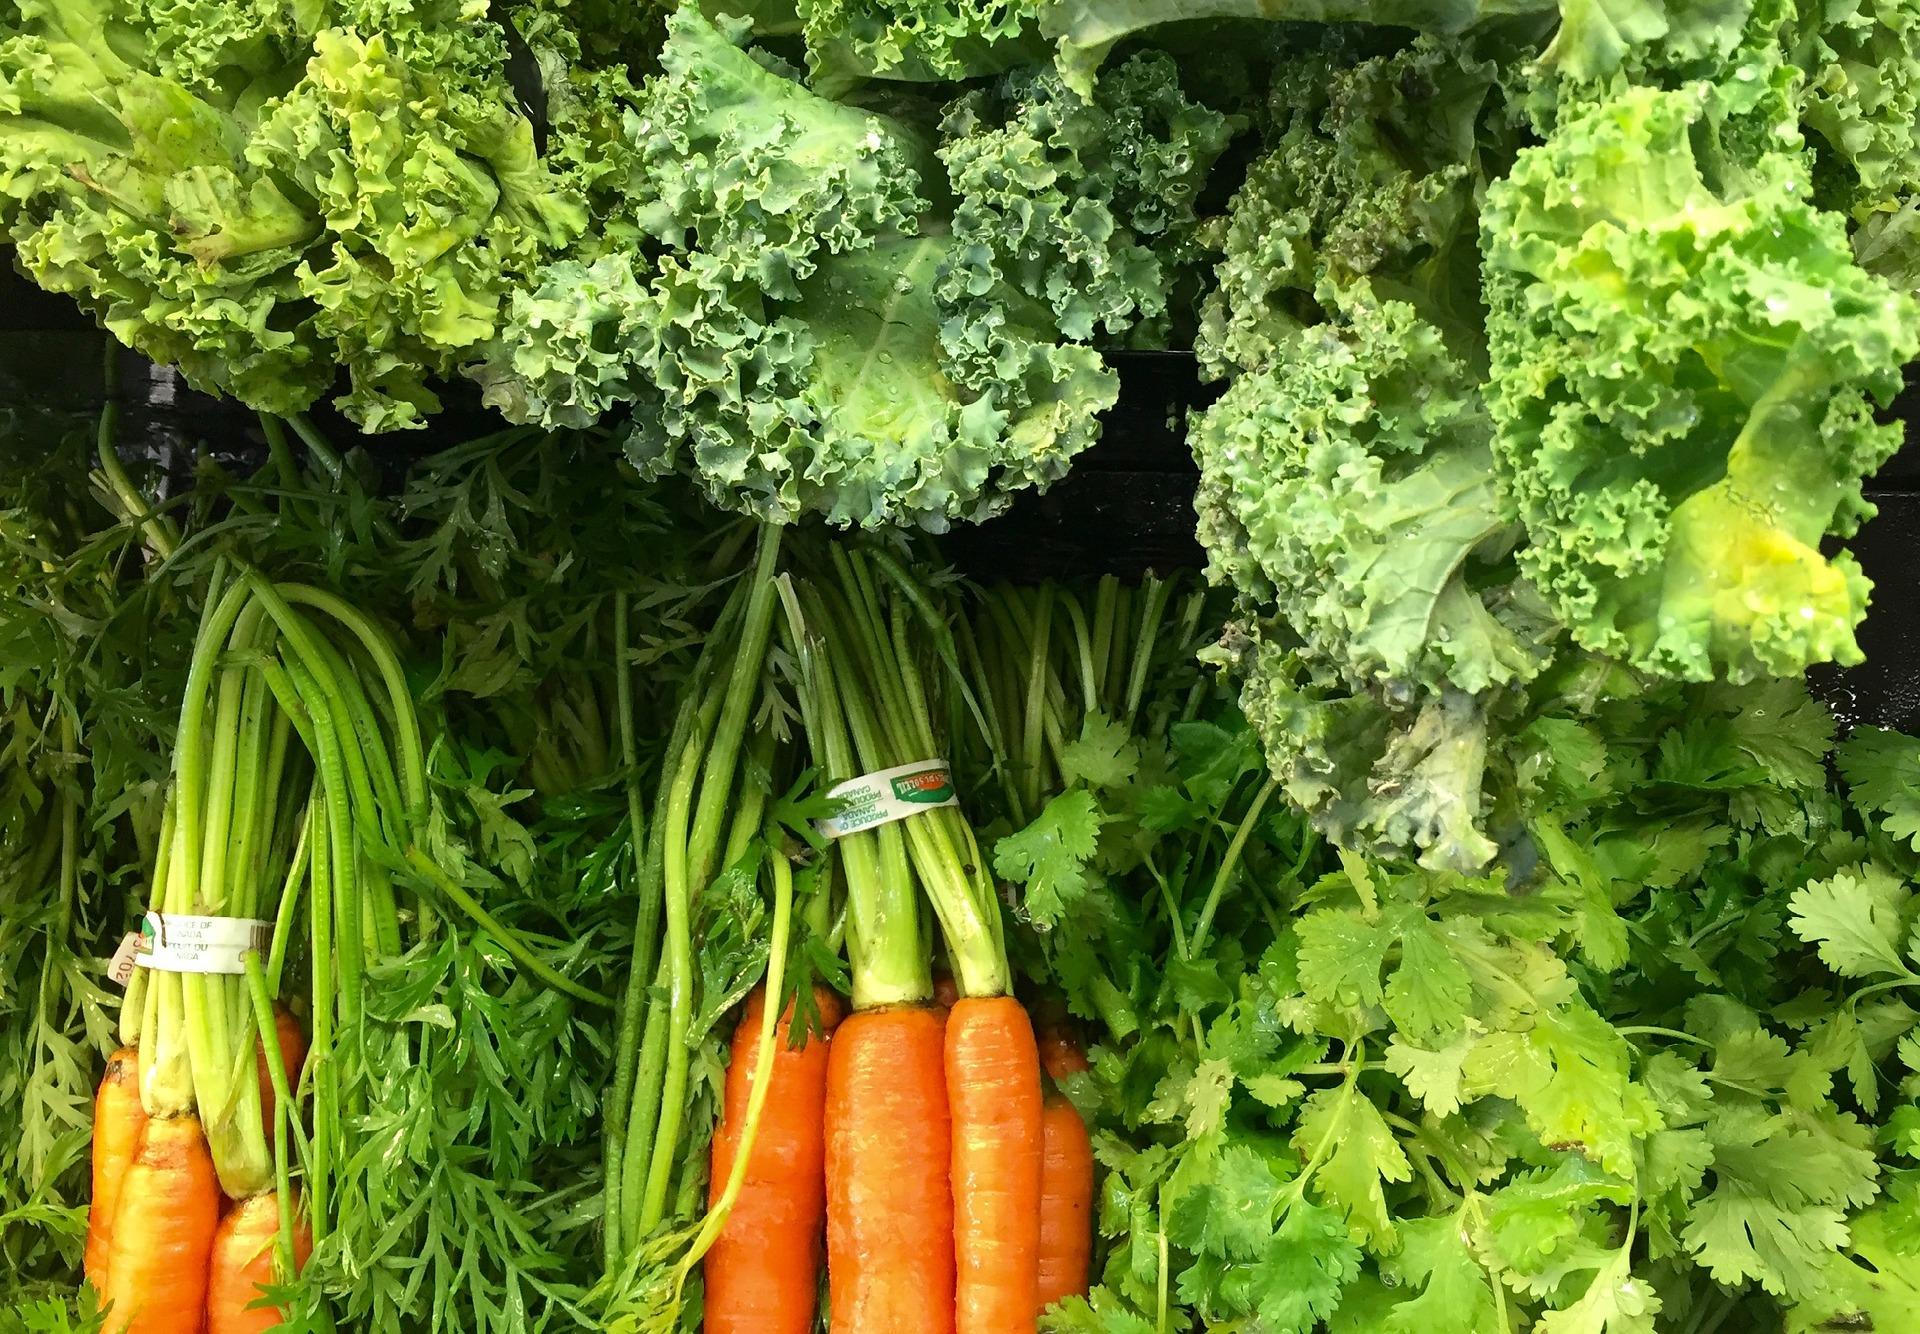 vegetables-1730005_1920.jpg